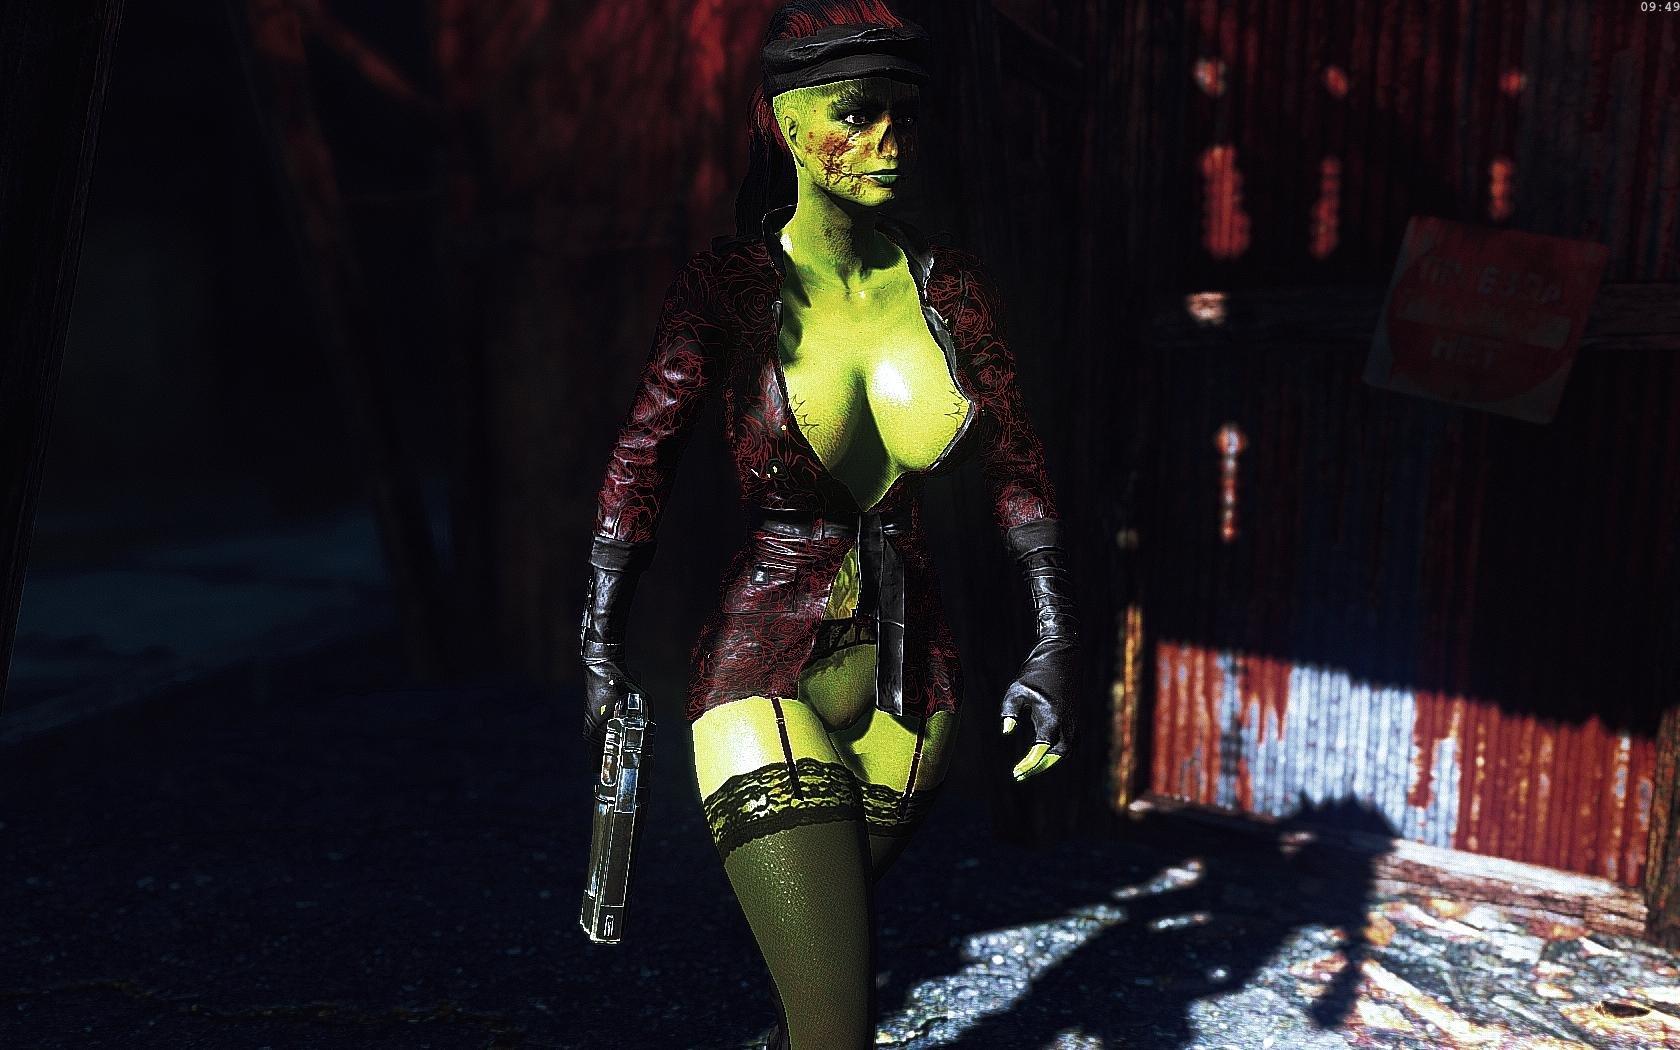 Fallout4 2019-05-28 09-49-25-84